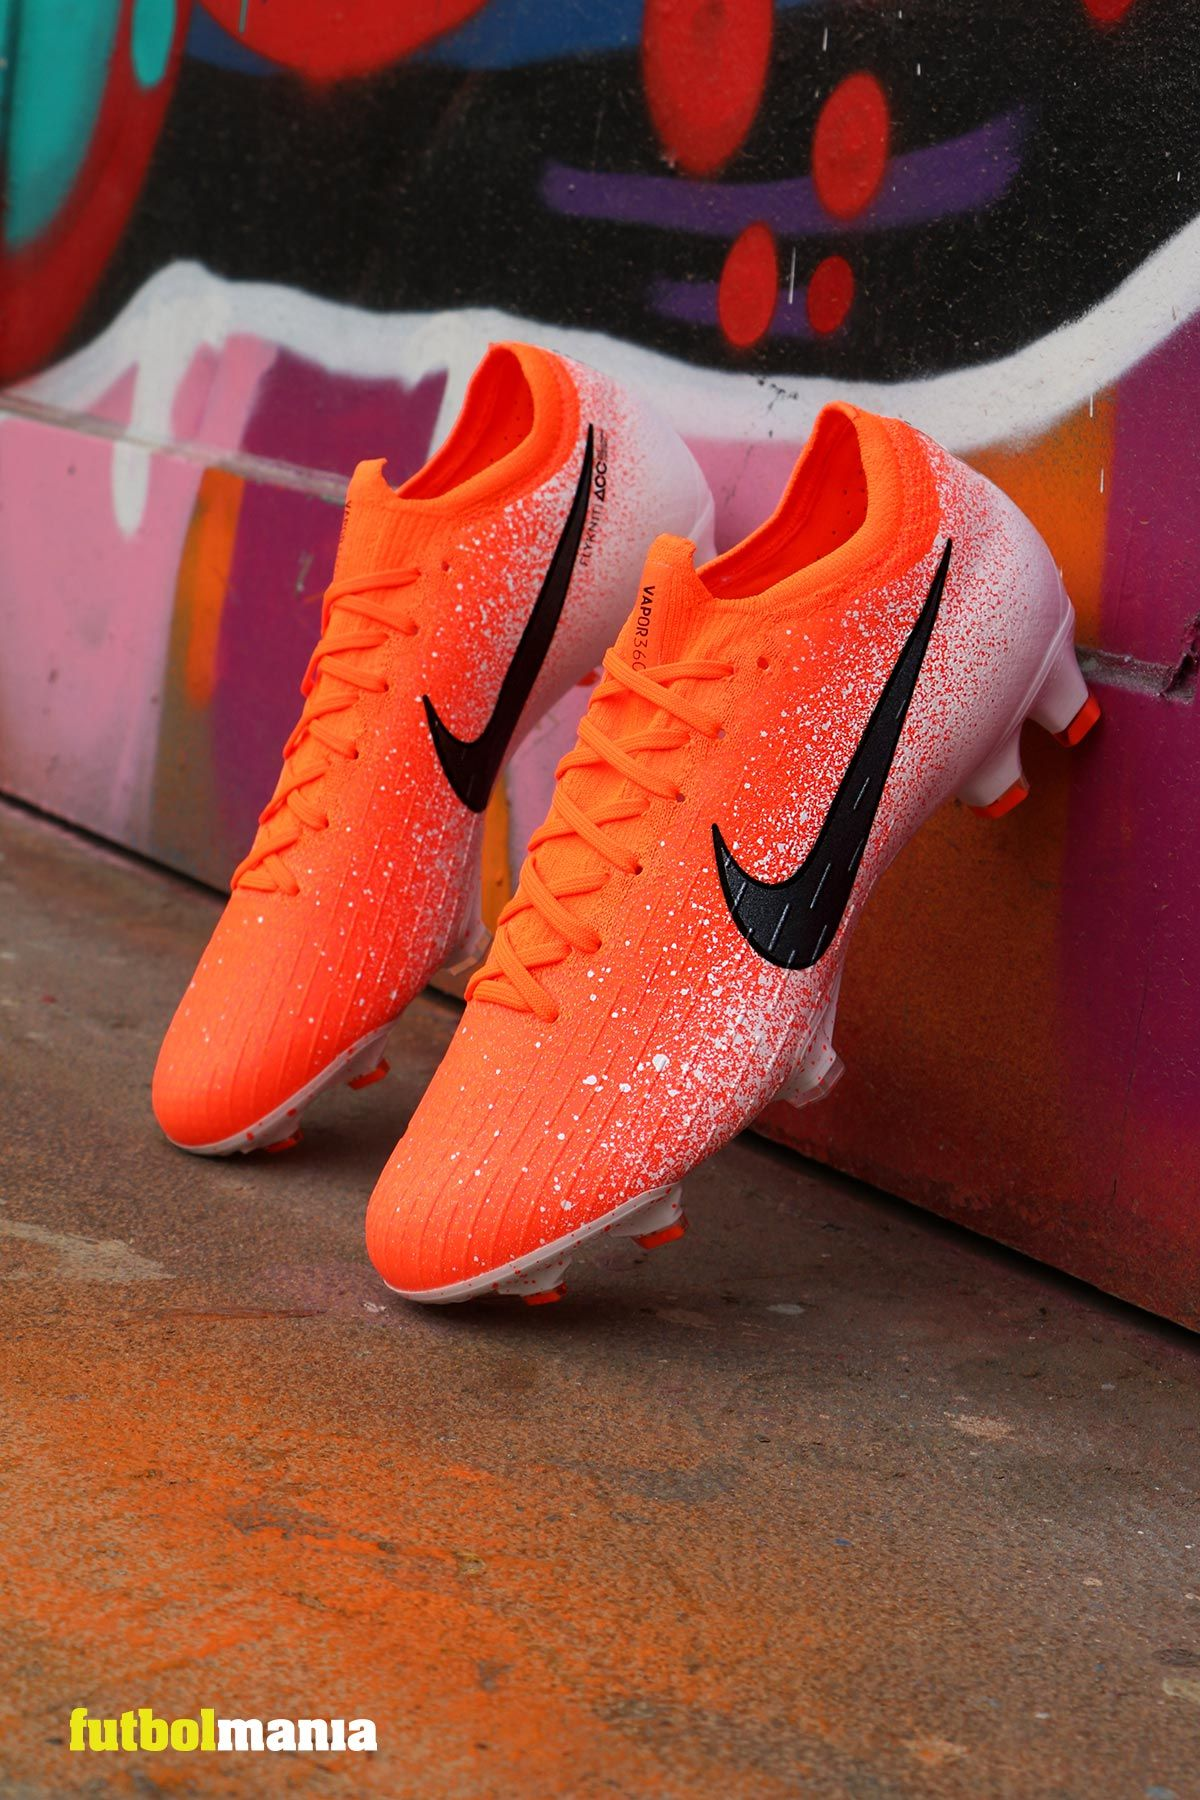 Botas de fútbol Nike Mercurial Vapor XII Elite FG